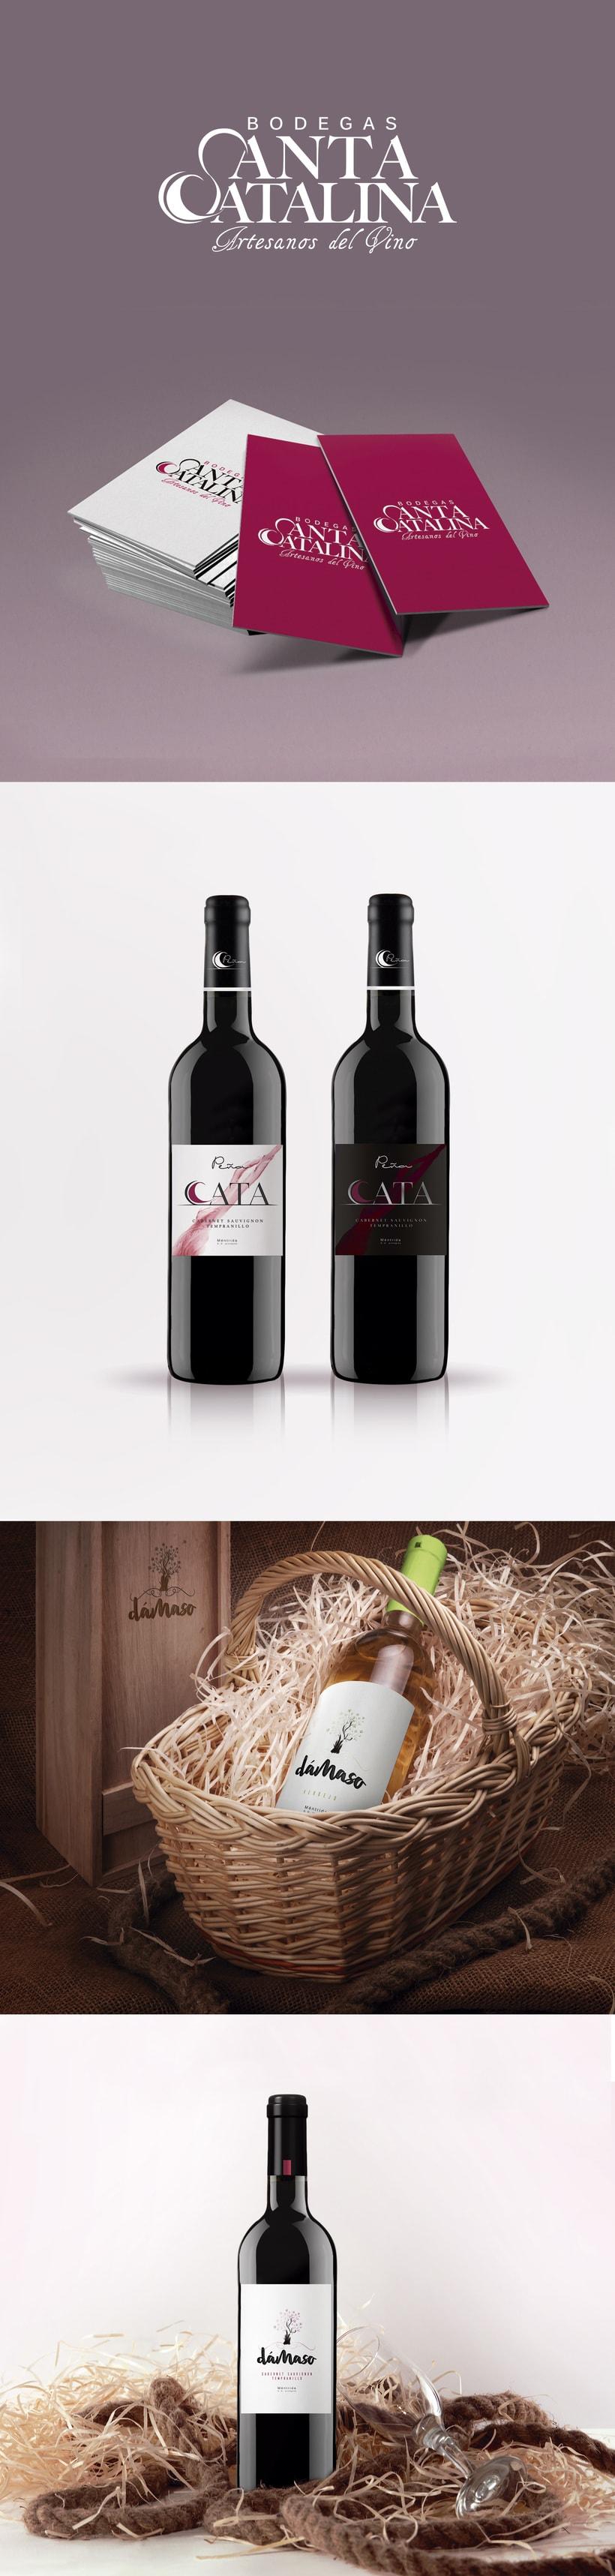 Branding · Diseño de etiquetas de vino Bodegas Santa Catalina -1